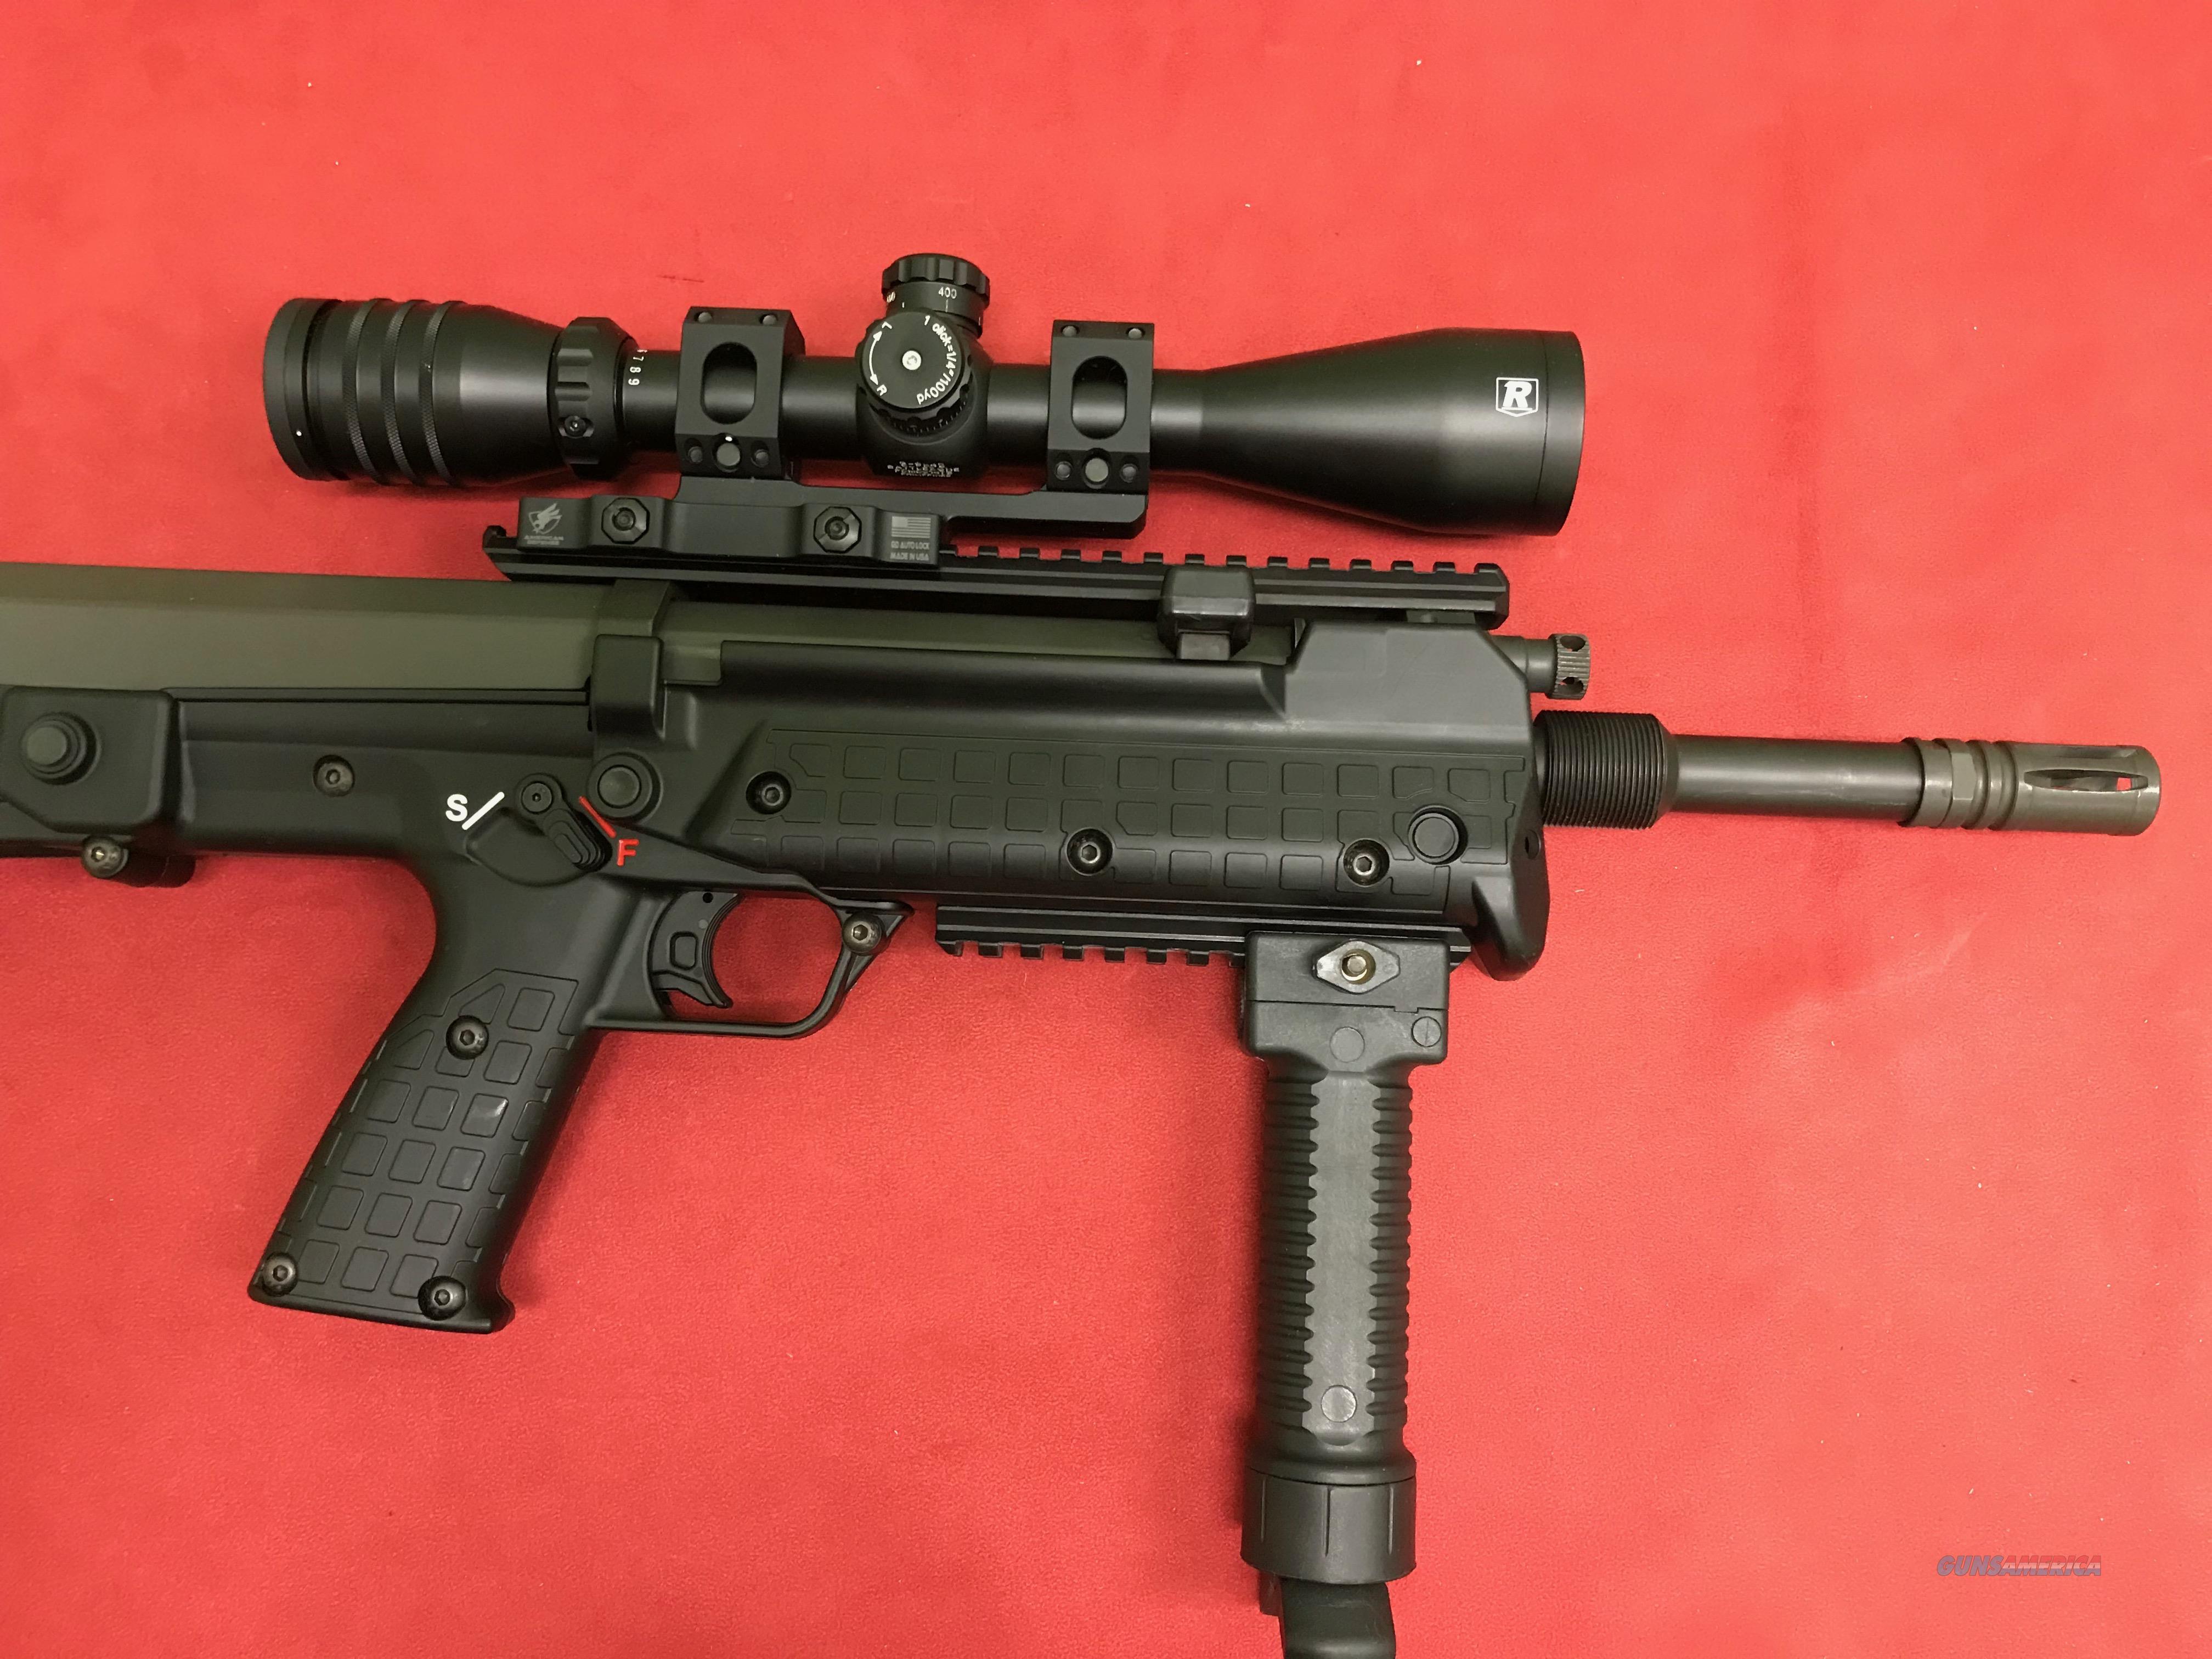 Kel-Tec RFB, .308 Win, w/ Scope, Like New!  Guns > Rifles > Kel-Tec Rifles